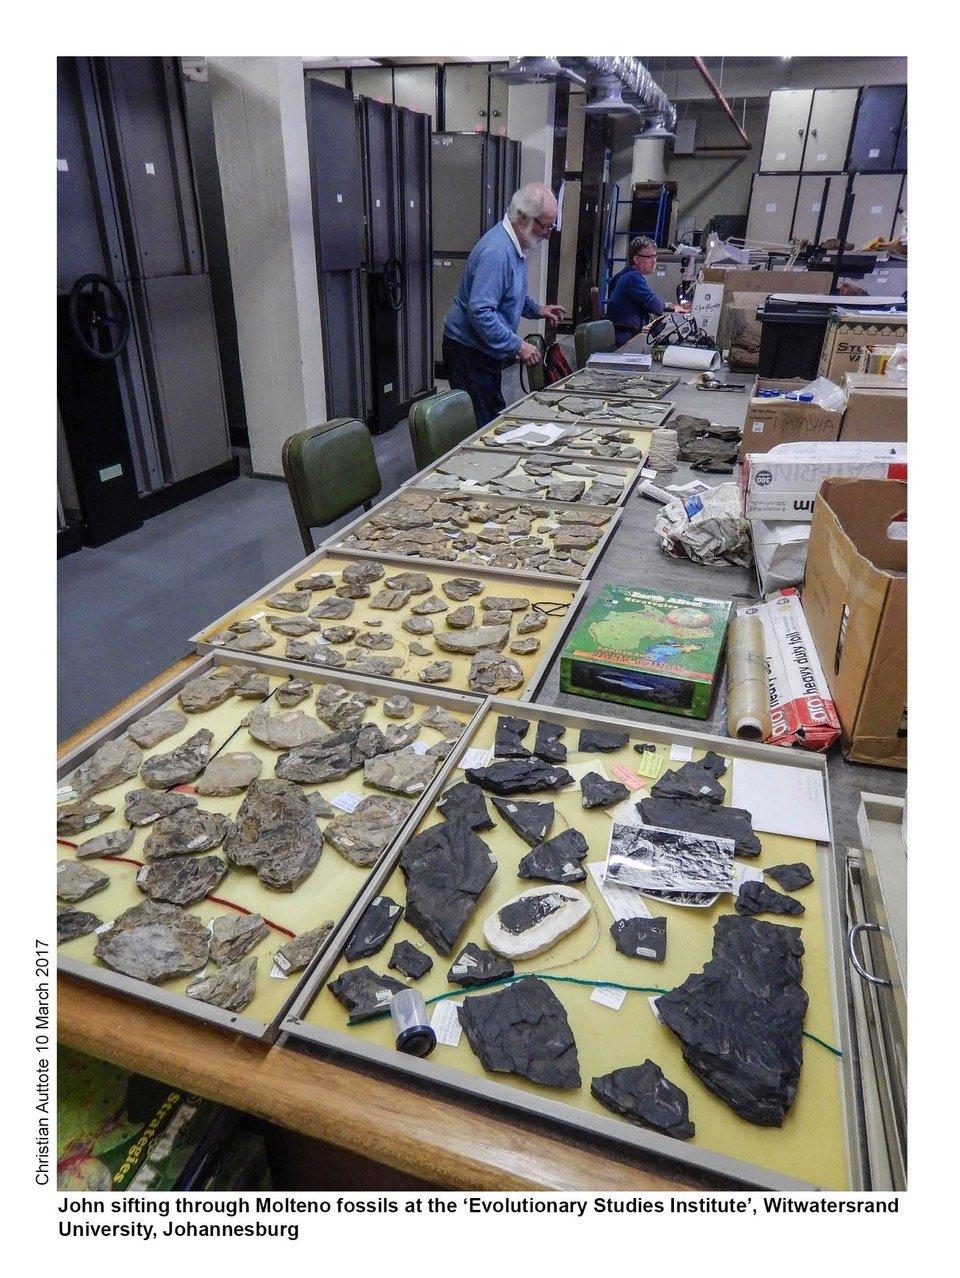 Molteno fossils at ESI